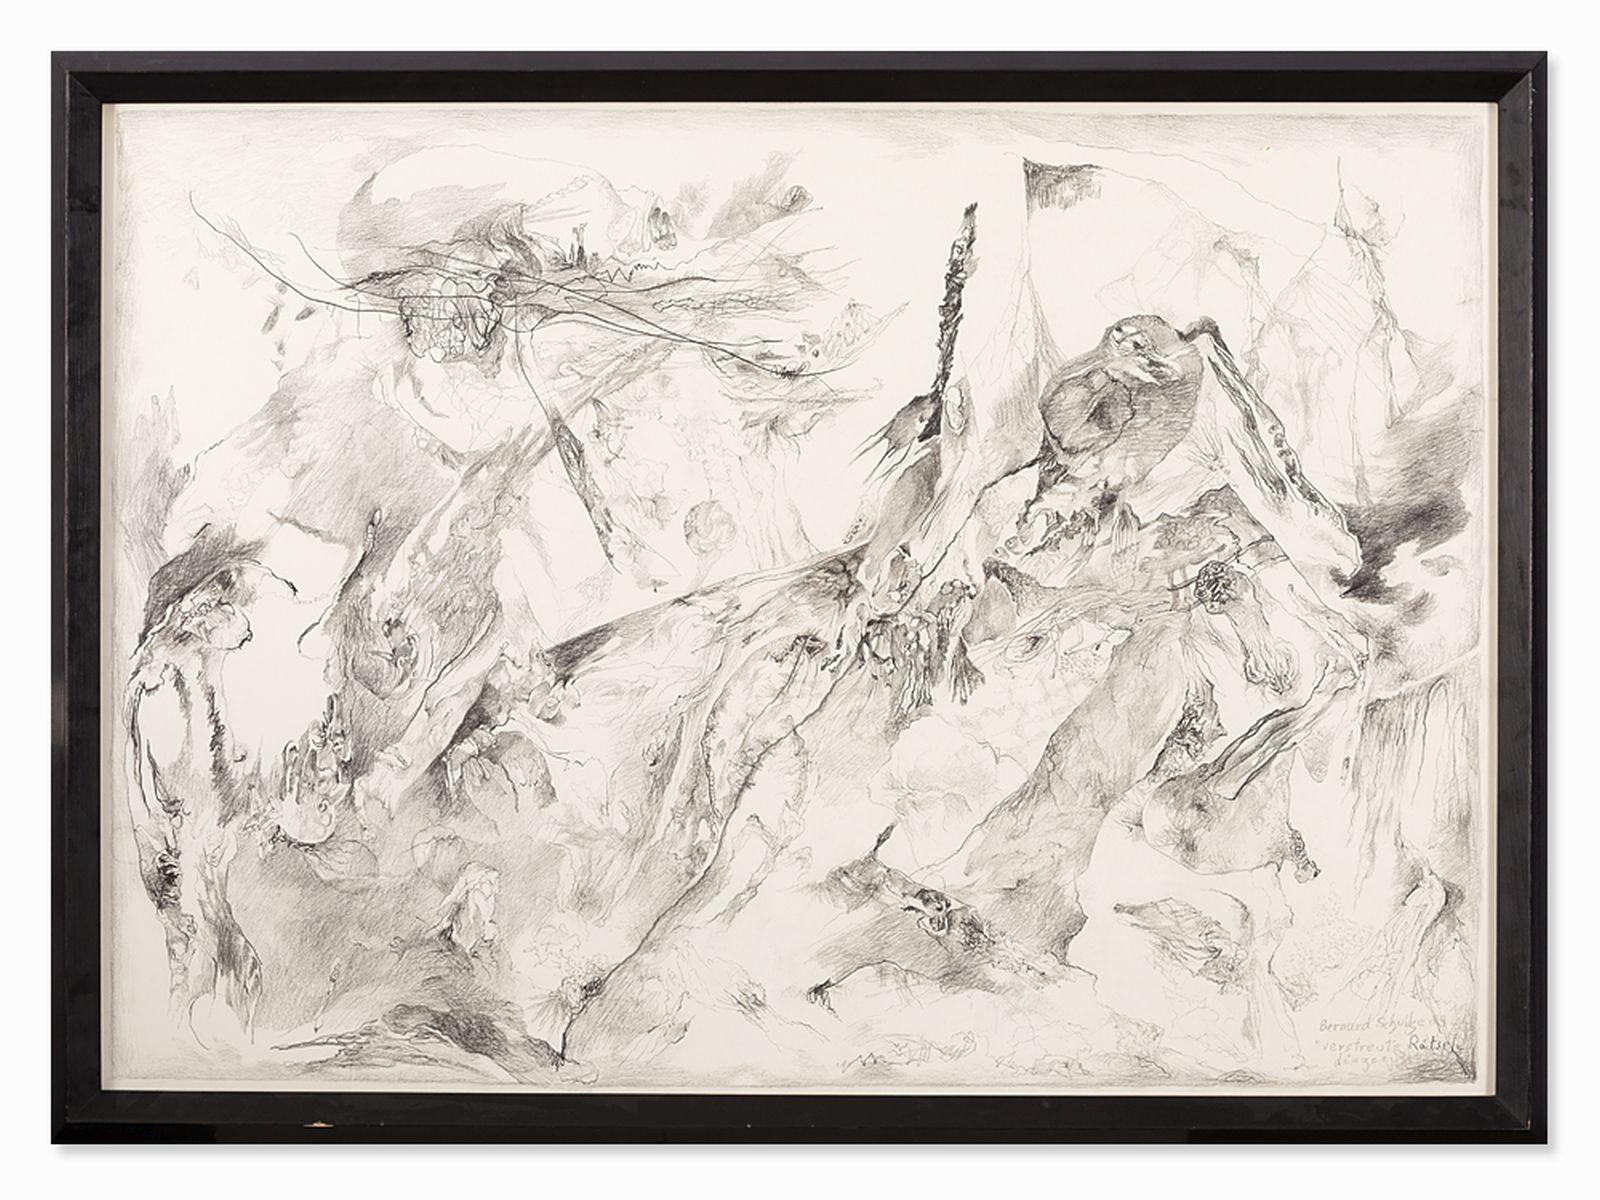 "#111 Bernard Schultze (1915-2005), Scattered mystery things 1989 | Bernard Schultze (1915-2005) "" Verstreute Rätseldinge"" 1989 Image"